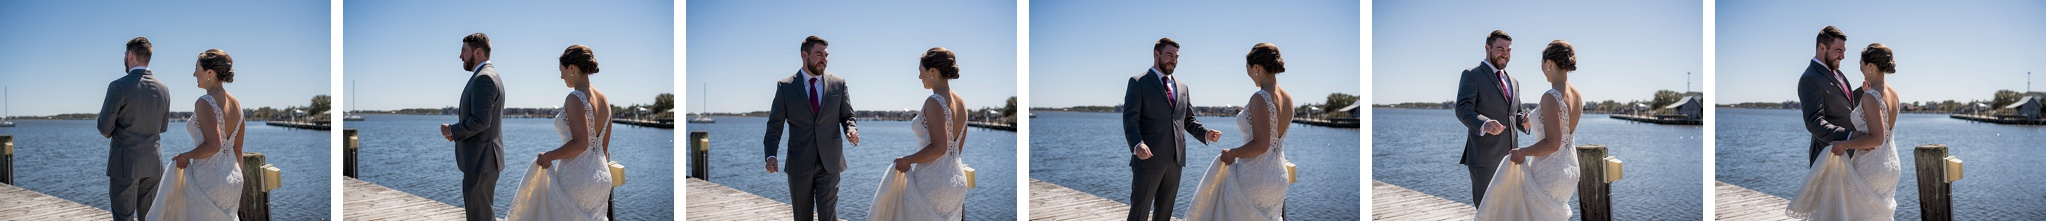 Manteo-NC-Wedding-Photographer-114.jpg